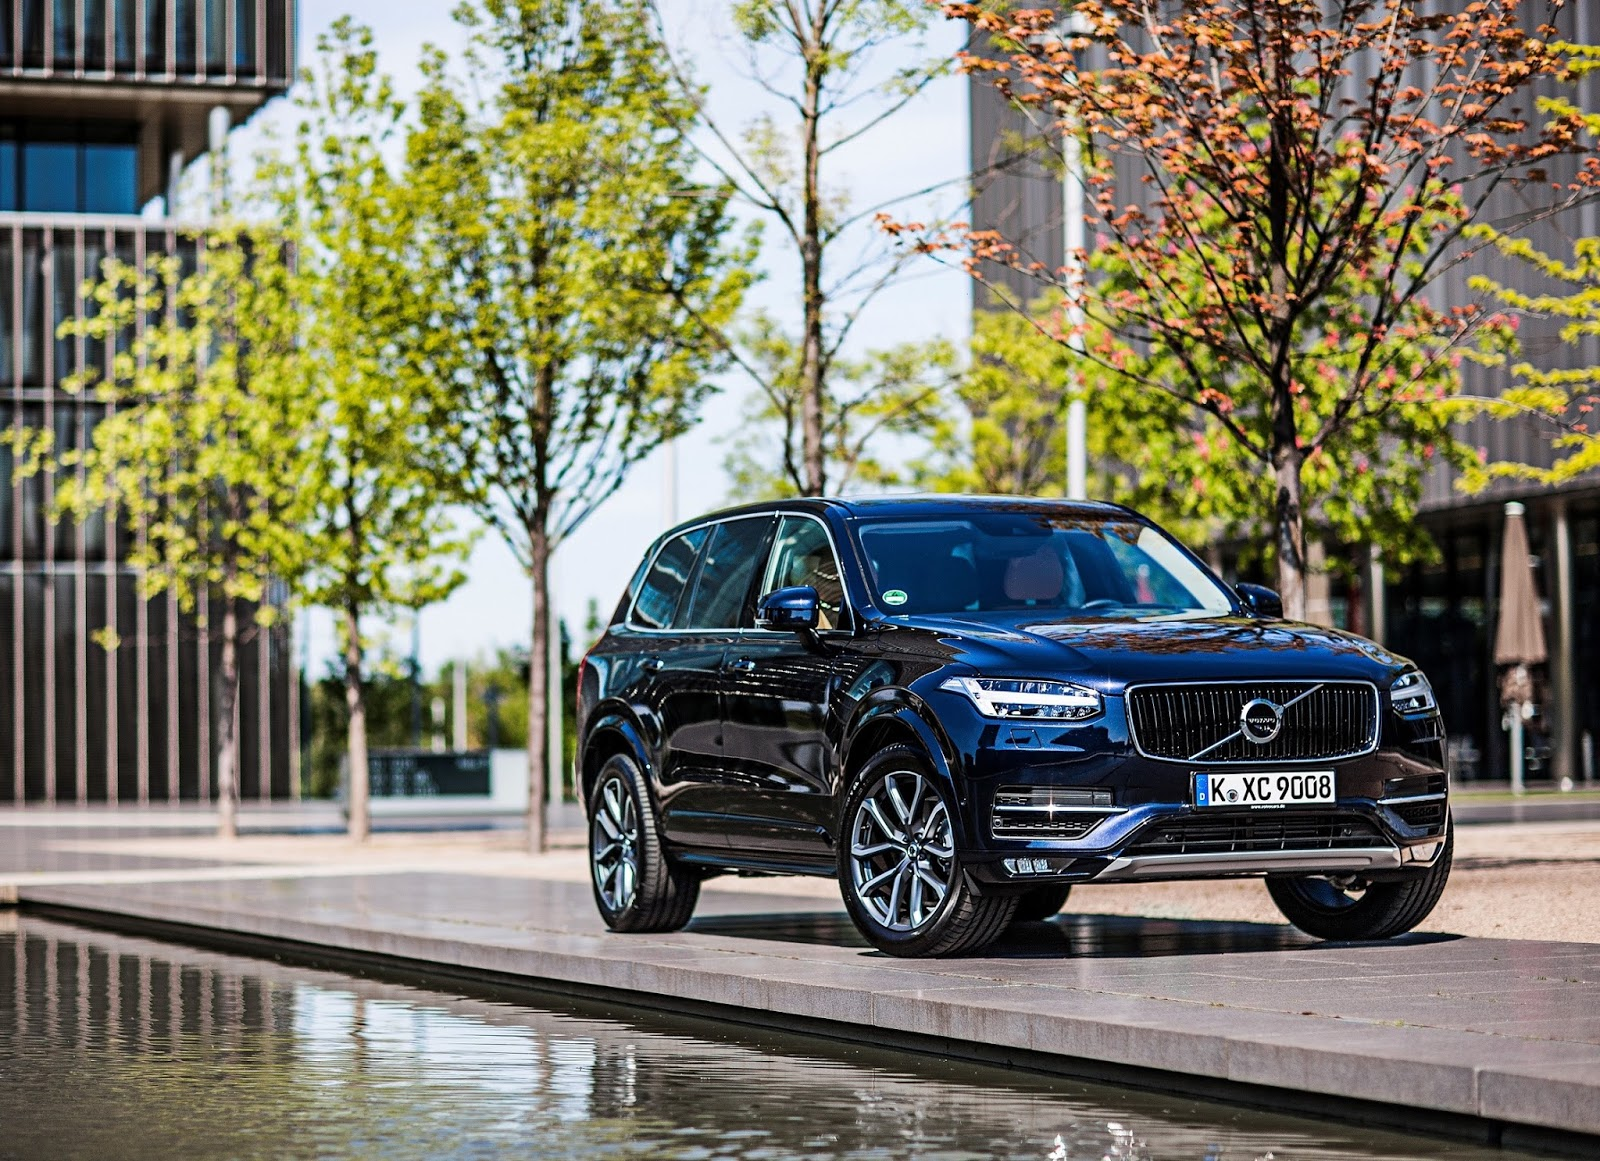 NEW%2BVOLVO%2BXC90 Ρεκόρ πωλήσεων για τη Volvo στην Ελλάδα και το 2015 Sales, Volvo, Volvo V40 Cross Country, Volvo XC60, Volvo XC90